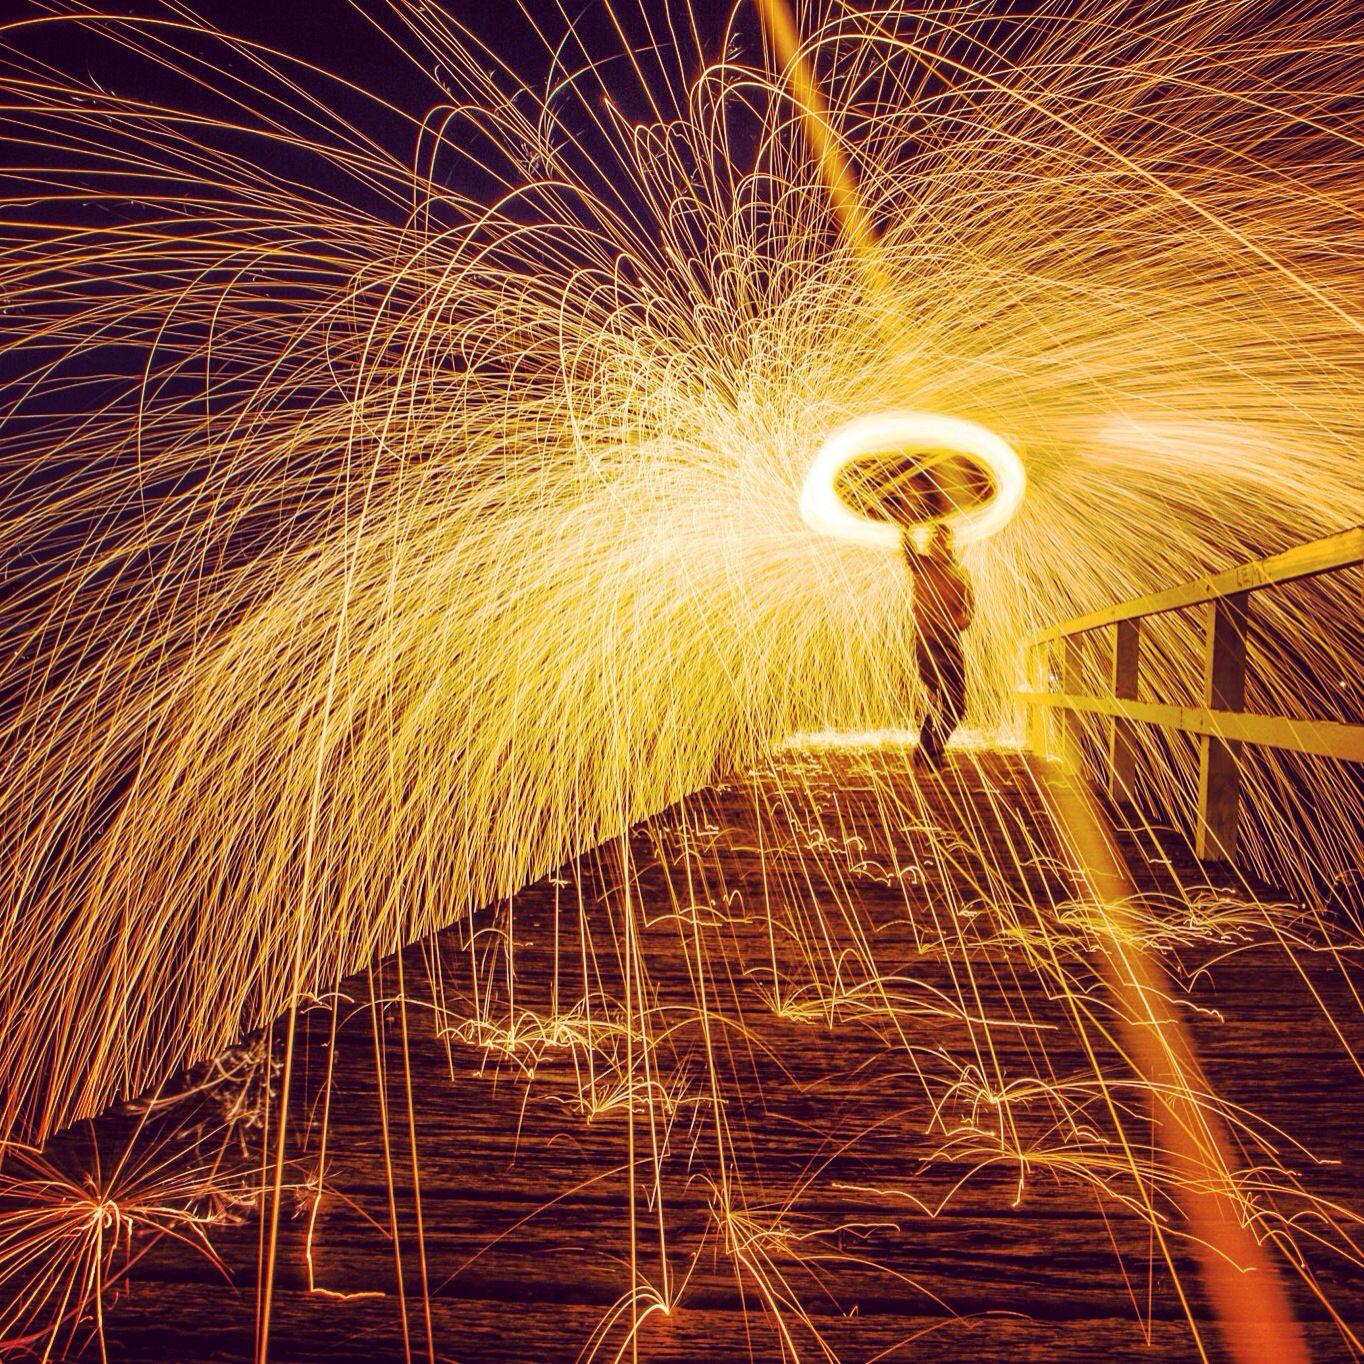 LightpaintLab.com Photo Update Steelwool Spin at Como Pier Sydney, NSW, Australia #lightpainting #photography